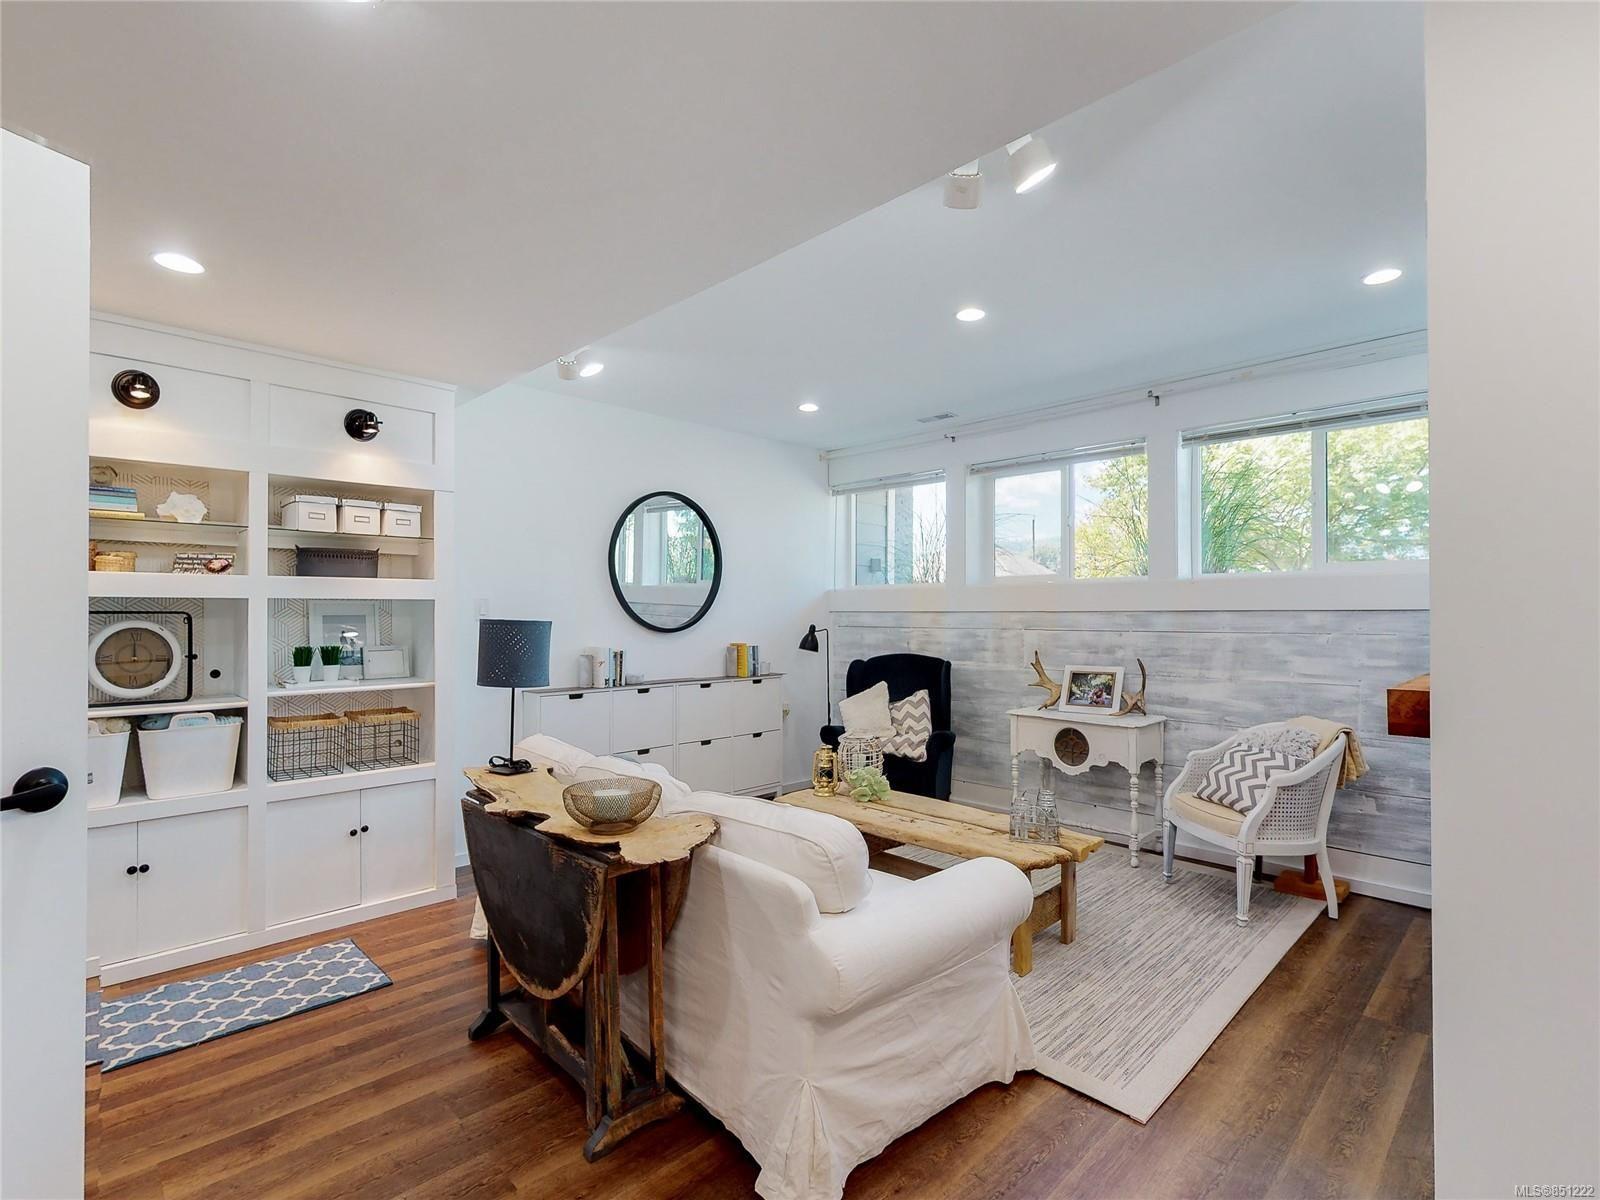 Photo 21: Photos: 2525 11th Ave in : PA Port Alberni House for sale (Port Alberni)  : MLS®# 851222